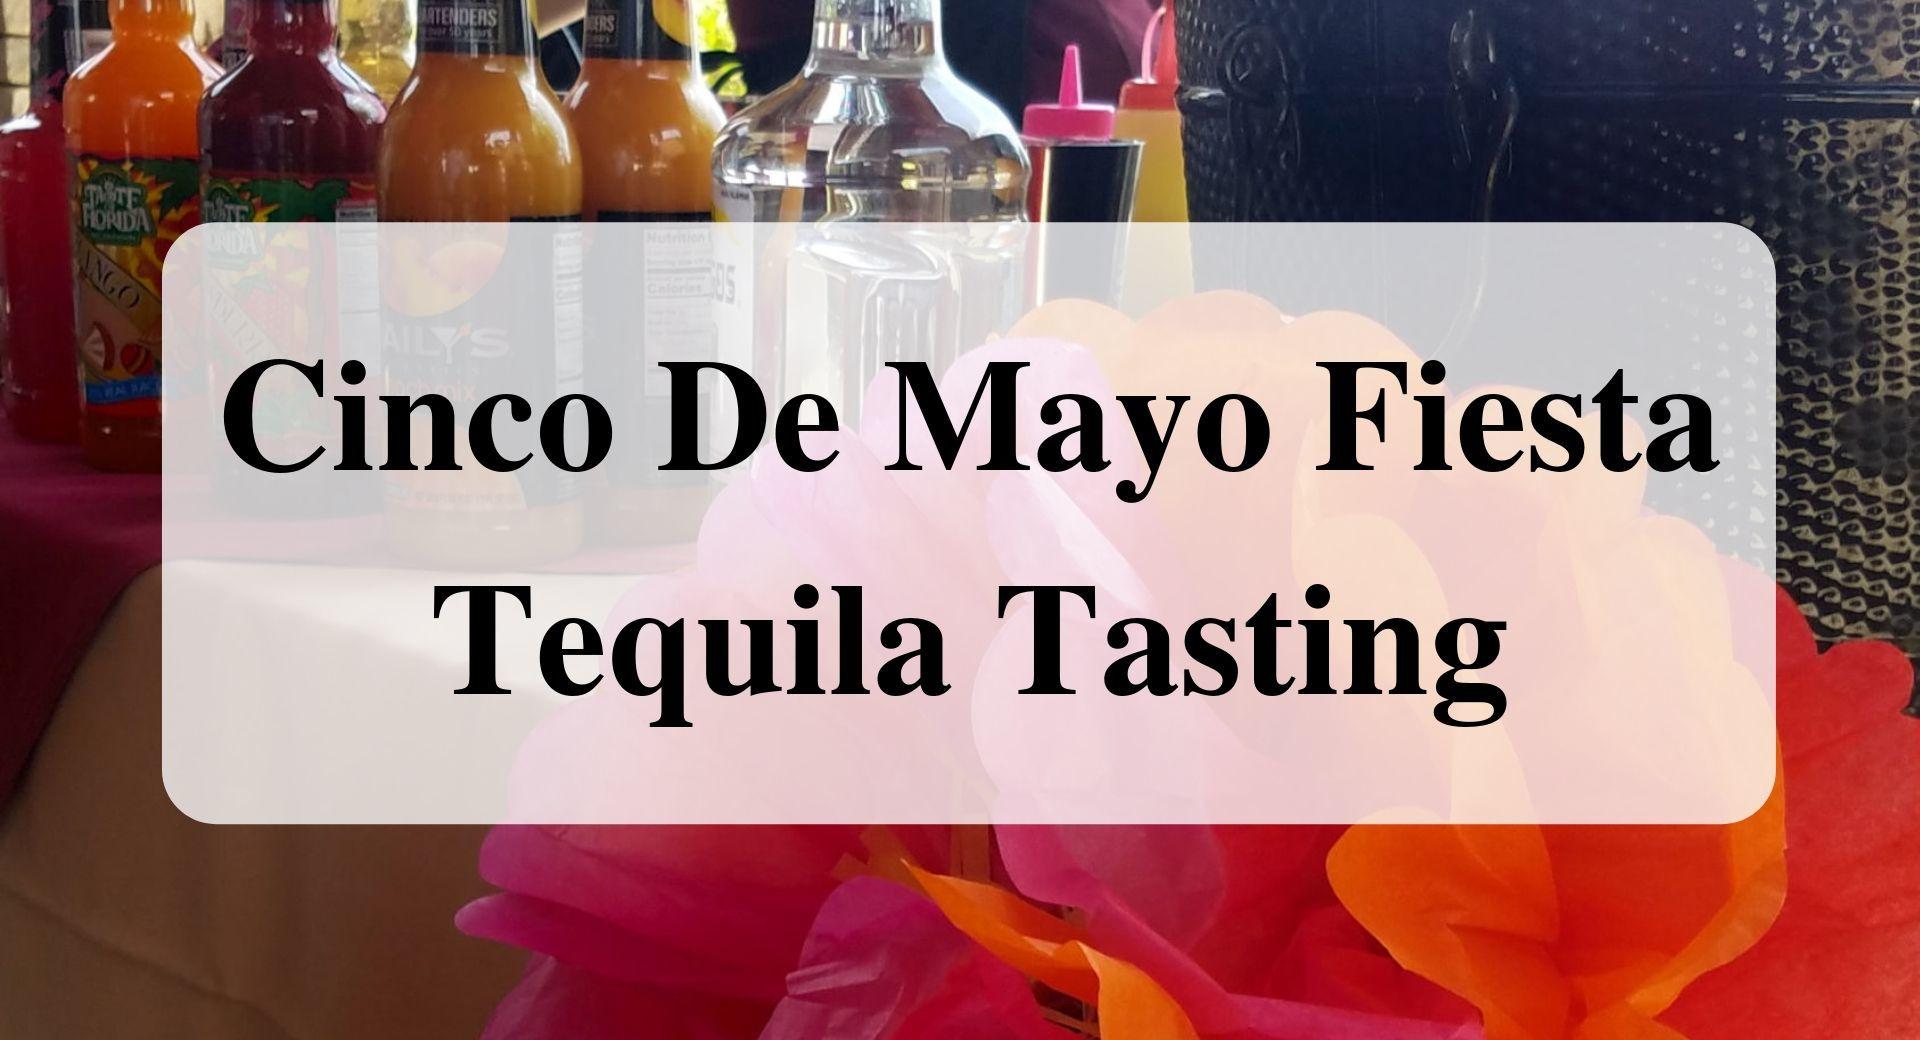 Cinco De Mayo Fiesta Tequila Tasting